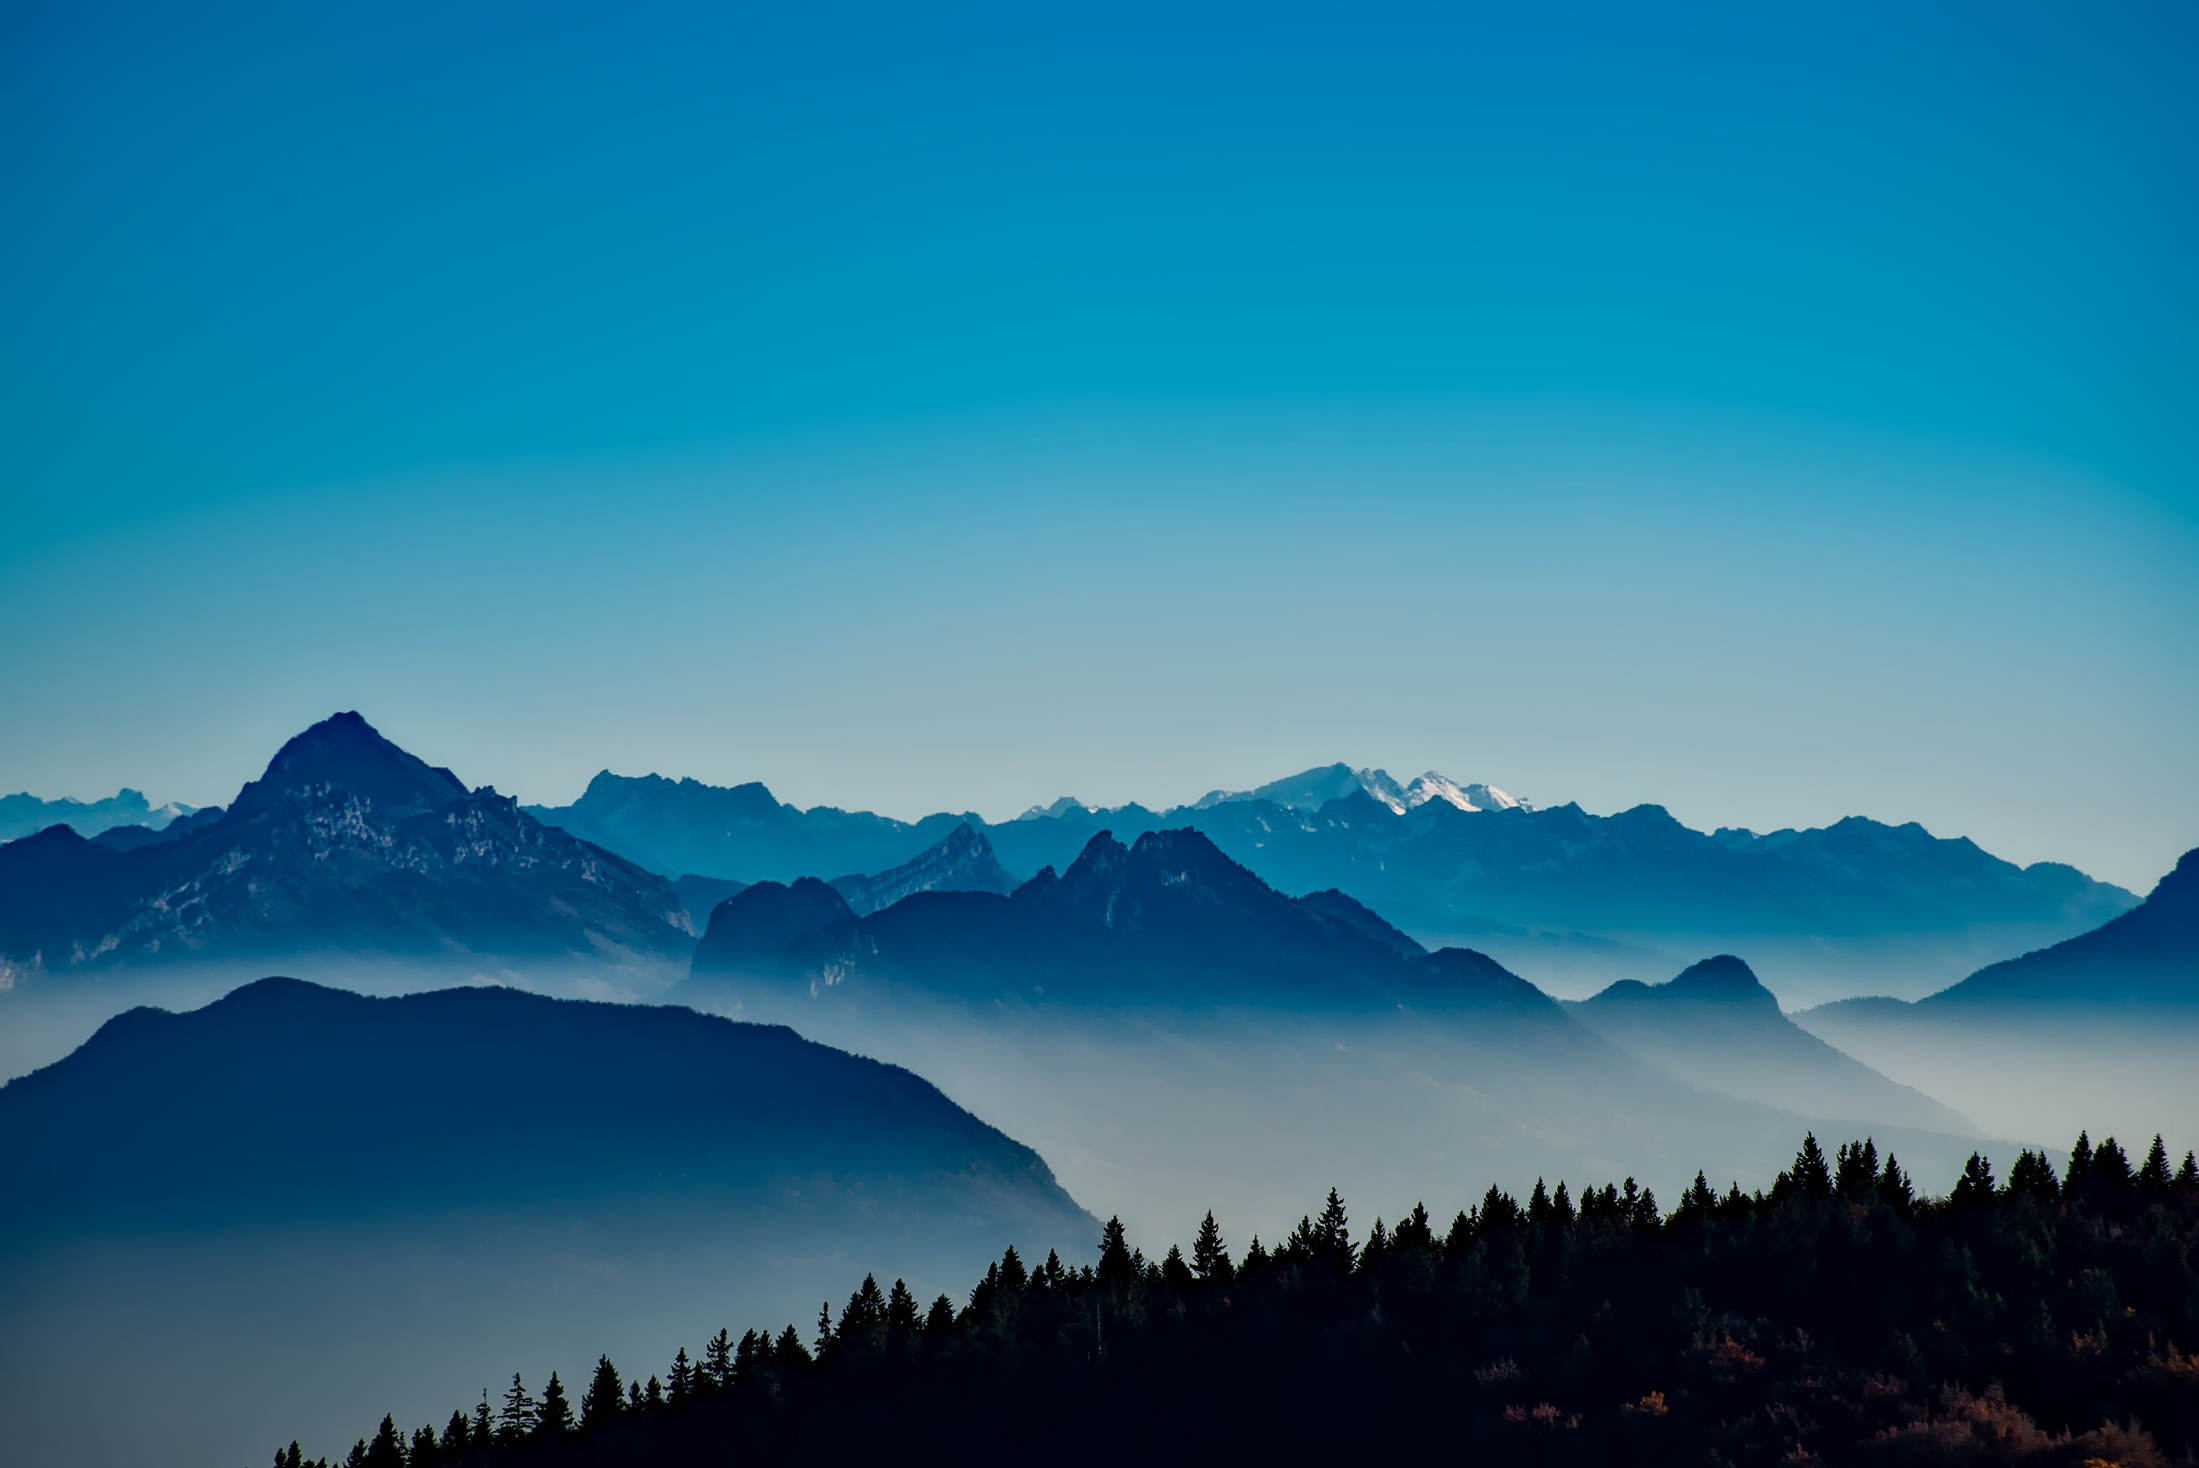 mountains mist trees 55